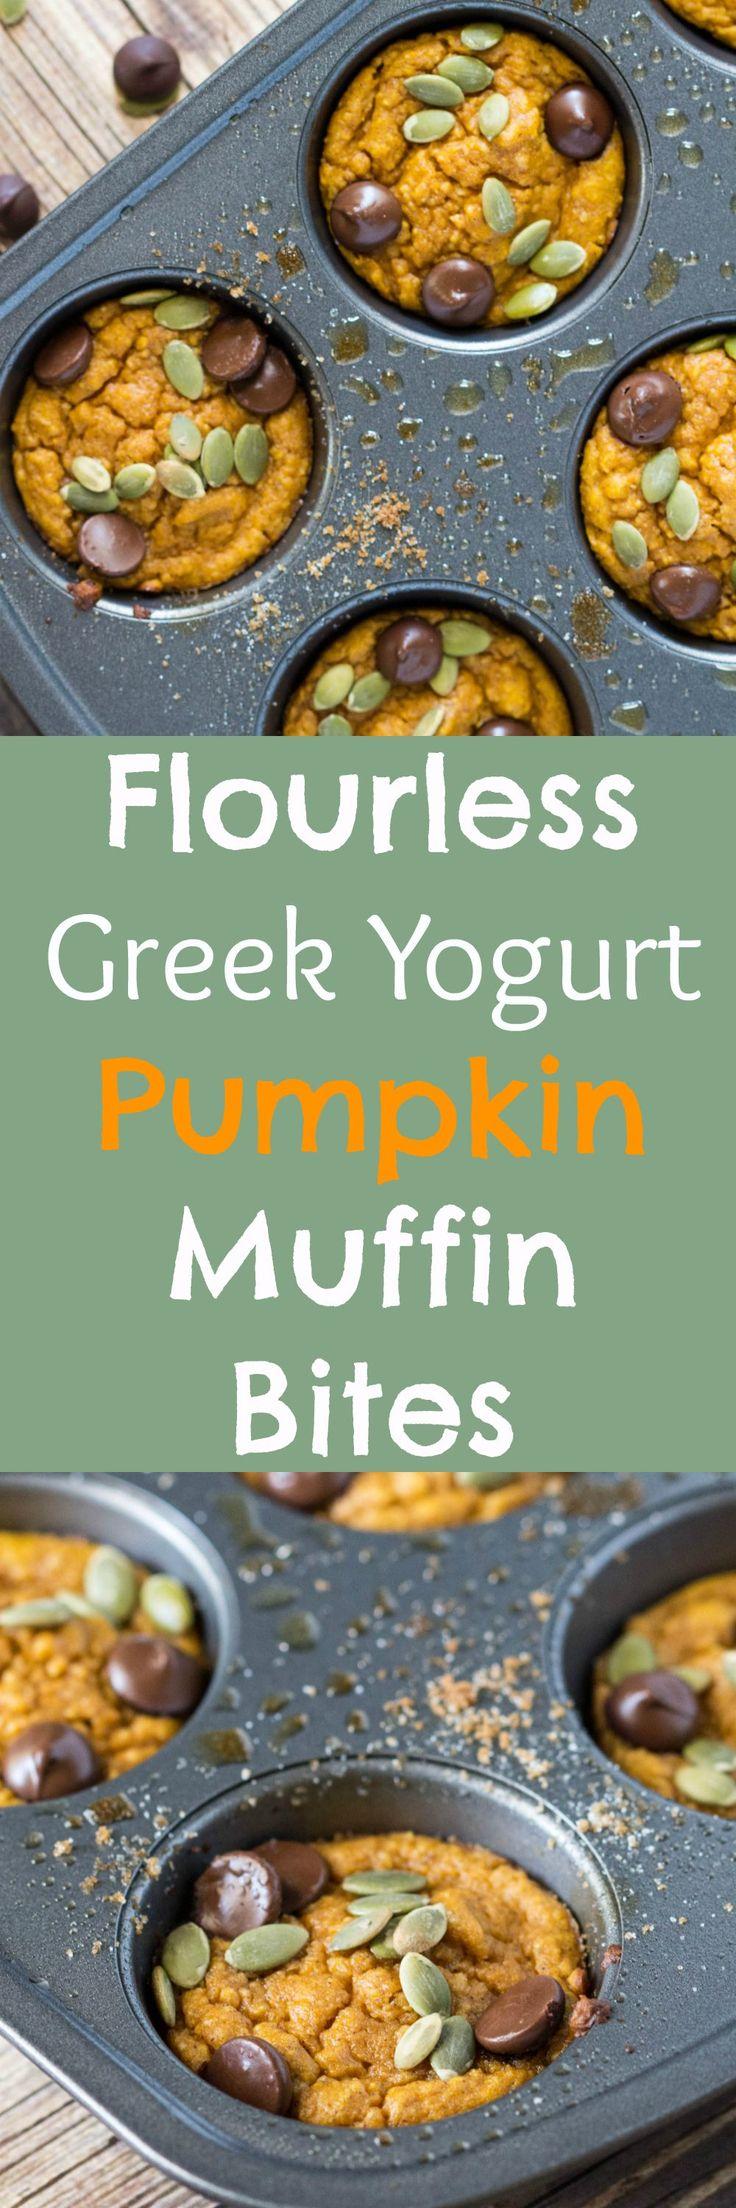 Flourless Greek Yogurt Pumpkin Muffin Bites! A delicious fall treat…